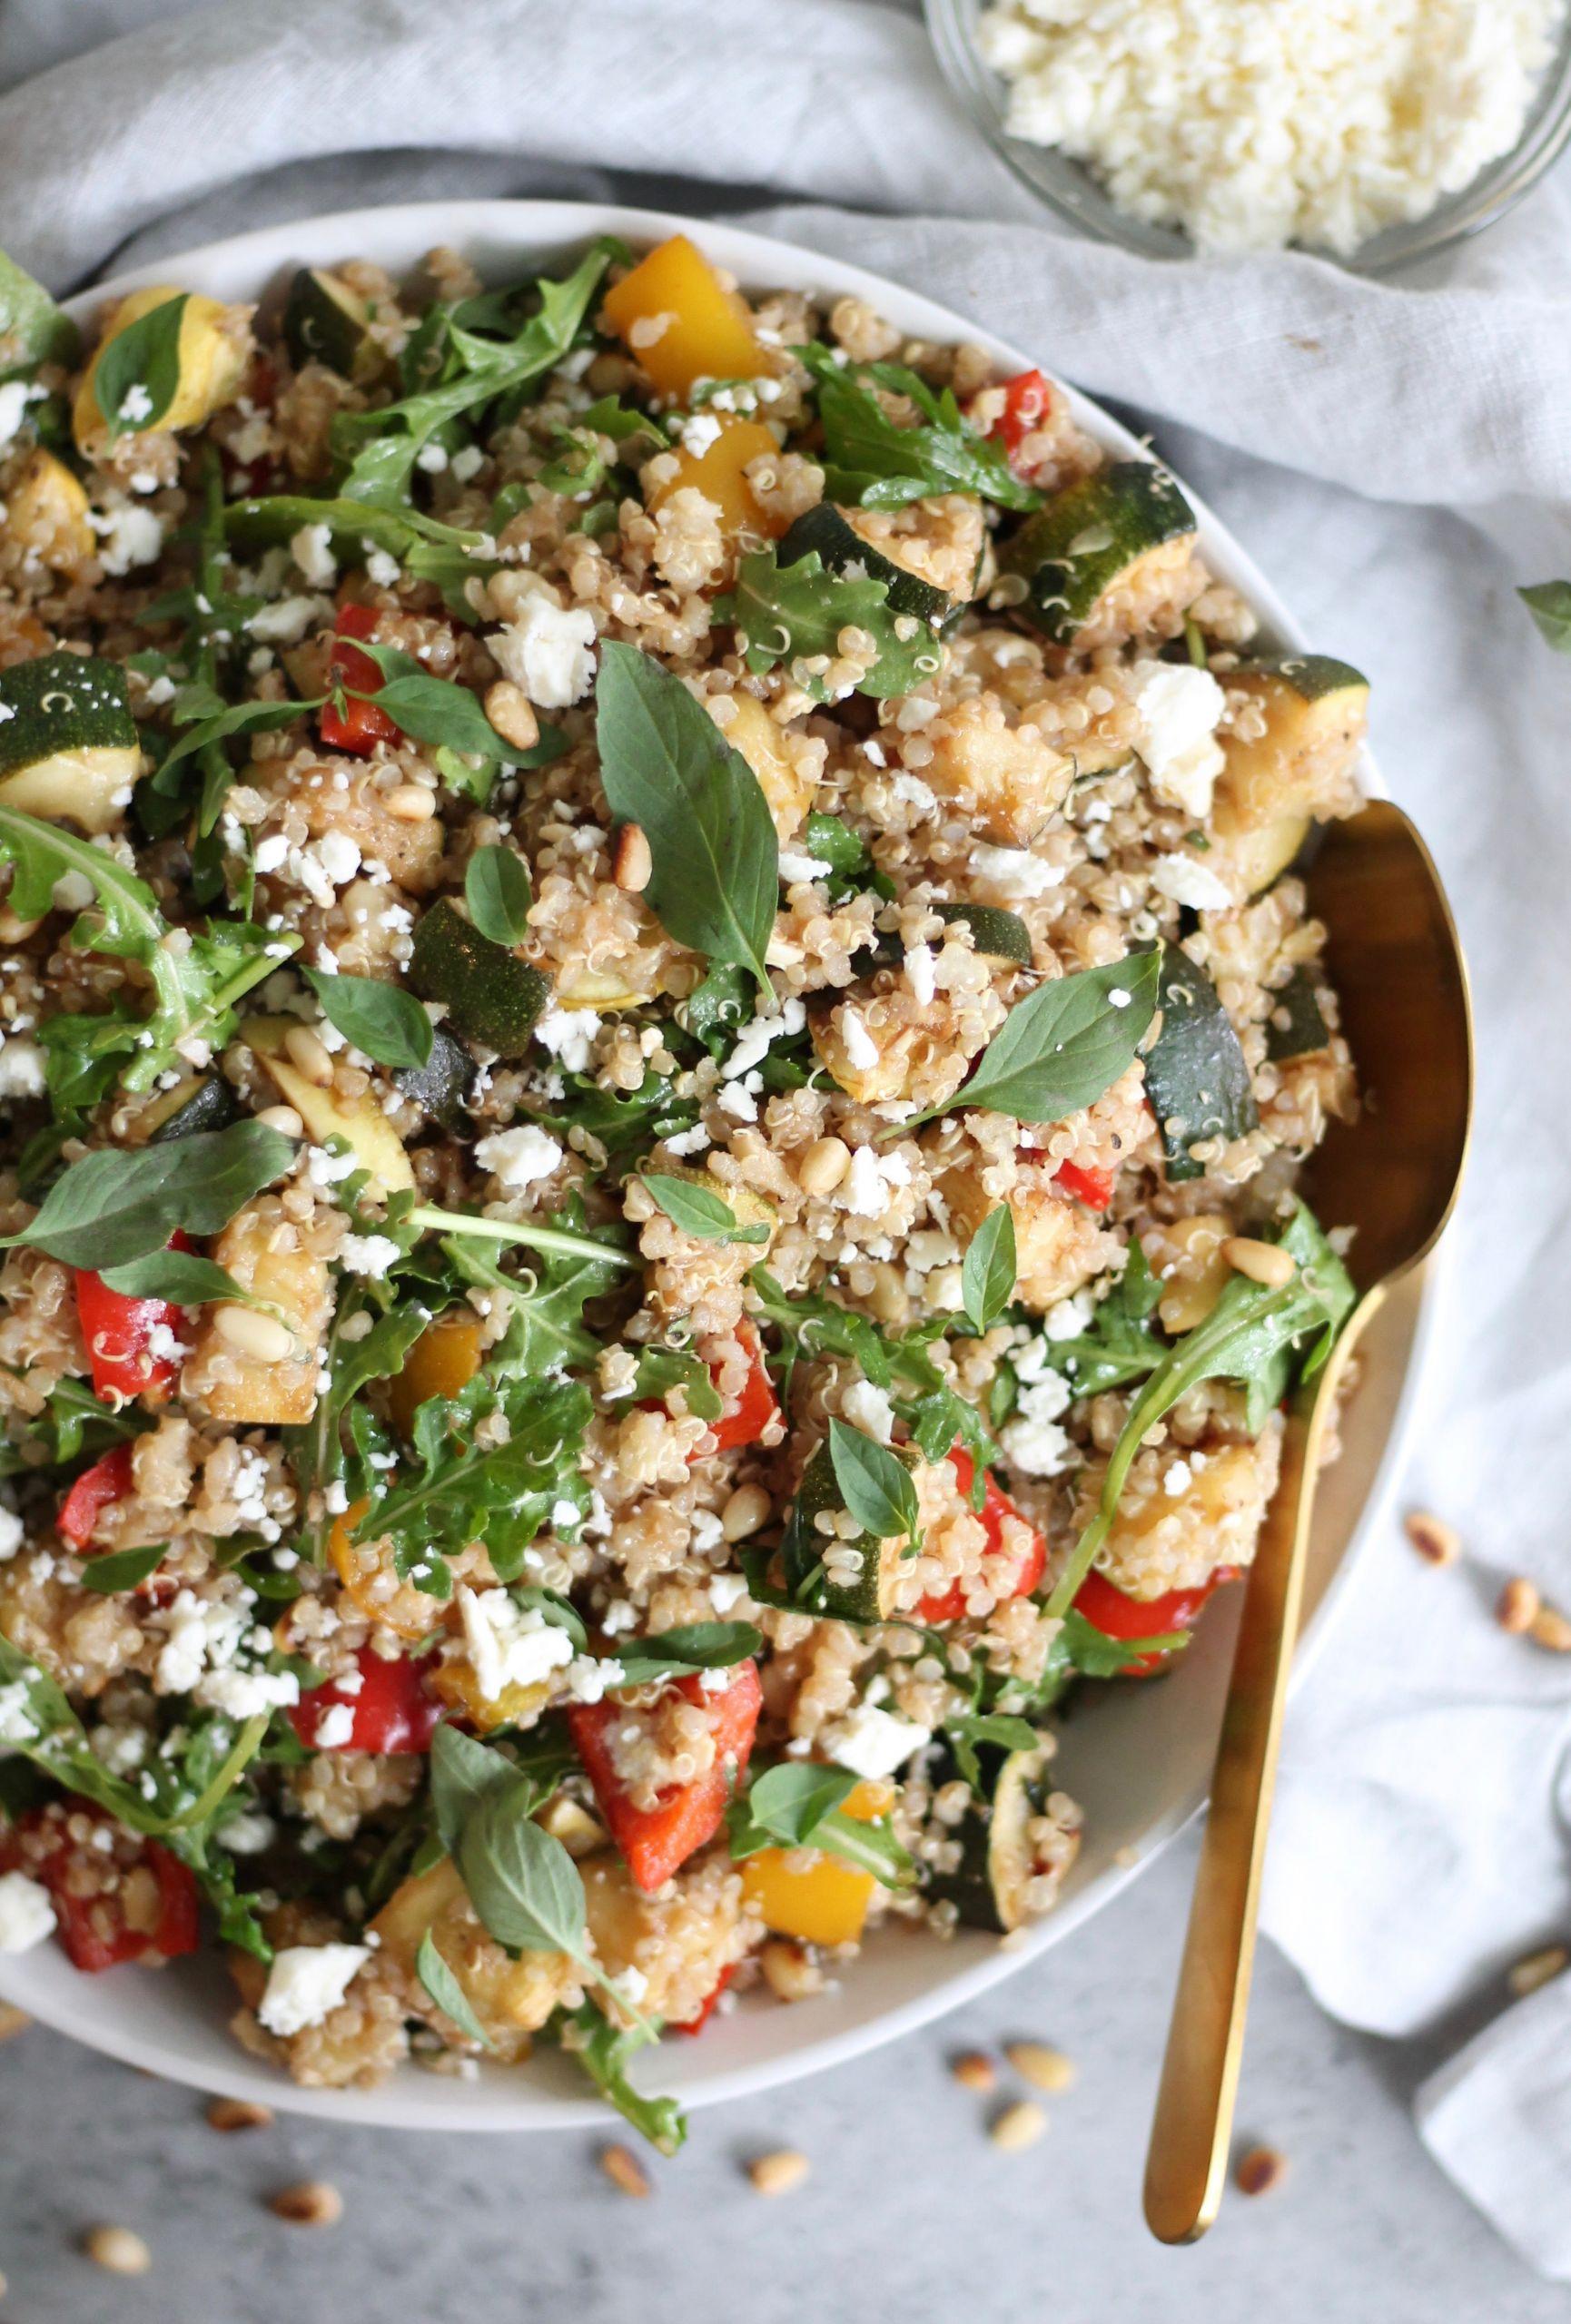 Roasted Vegetable Quinoa Salad  Balsamic Roasted Veggie Quinoa Salad with Feta Arugula